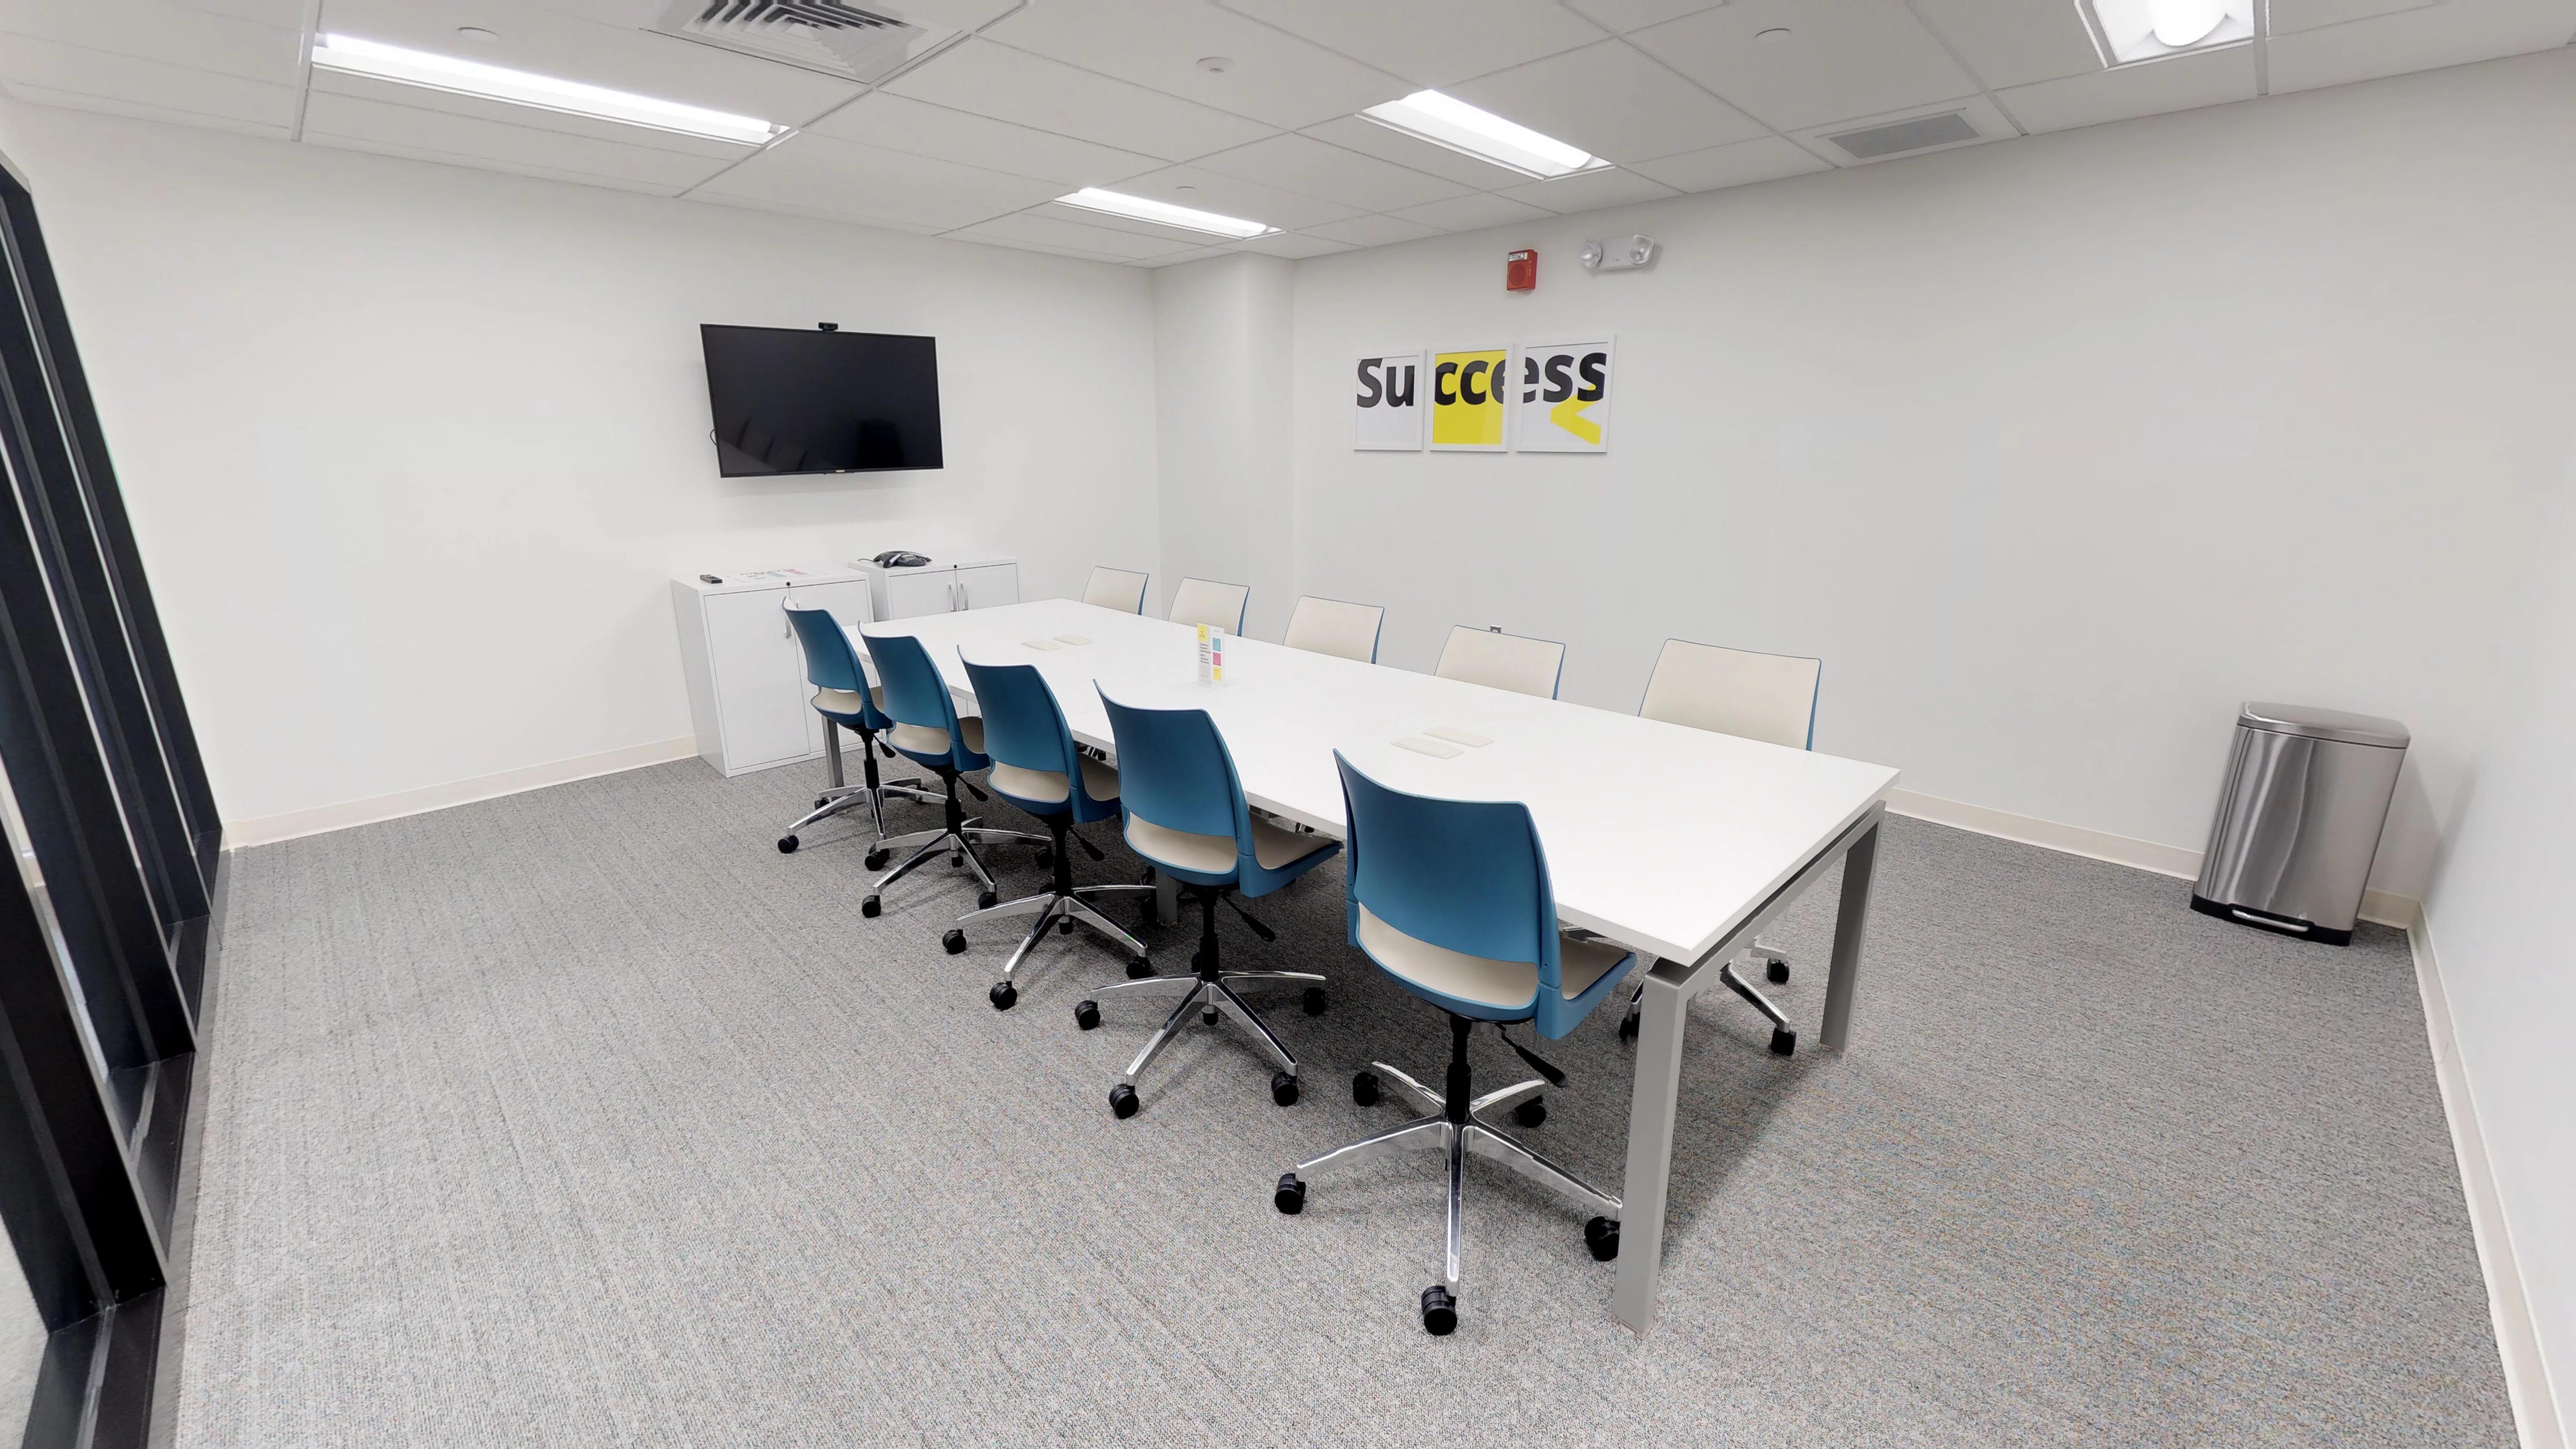 Upward Hartford - Success Conference Room